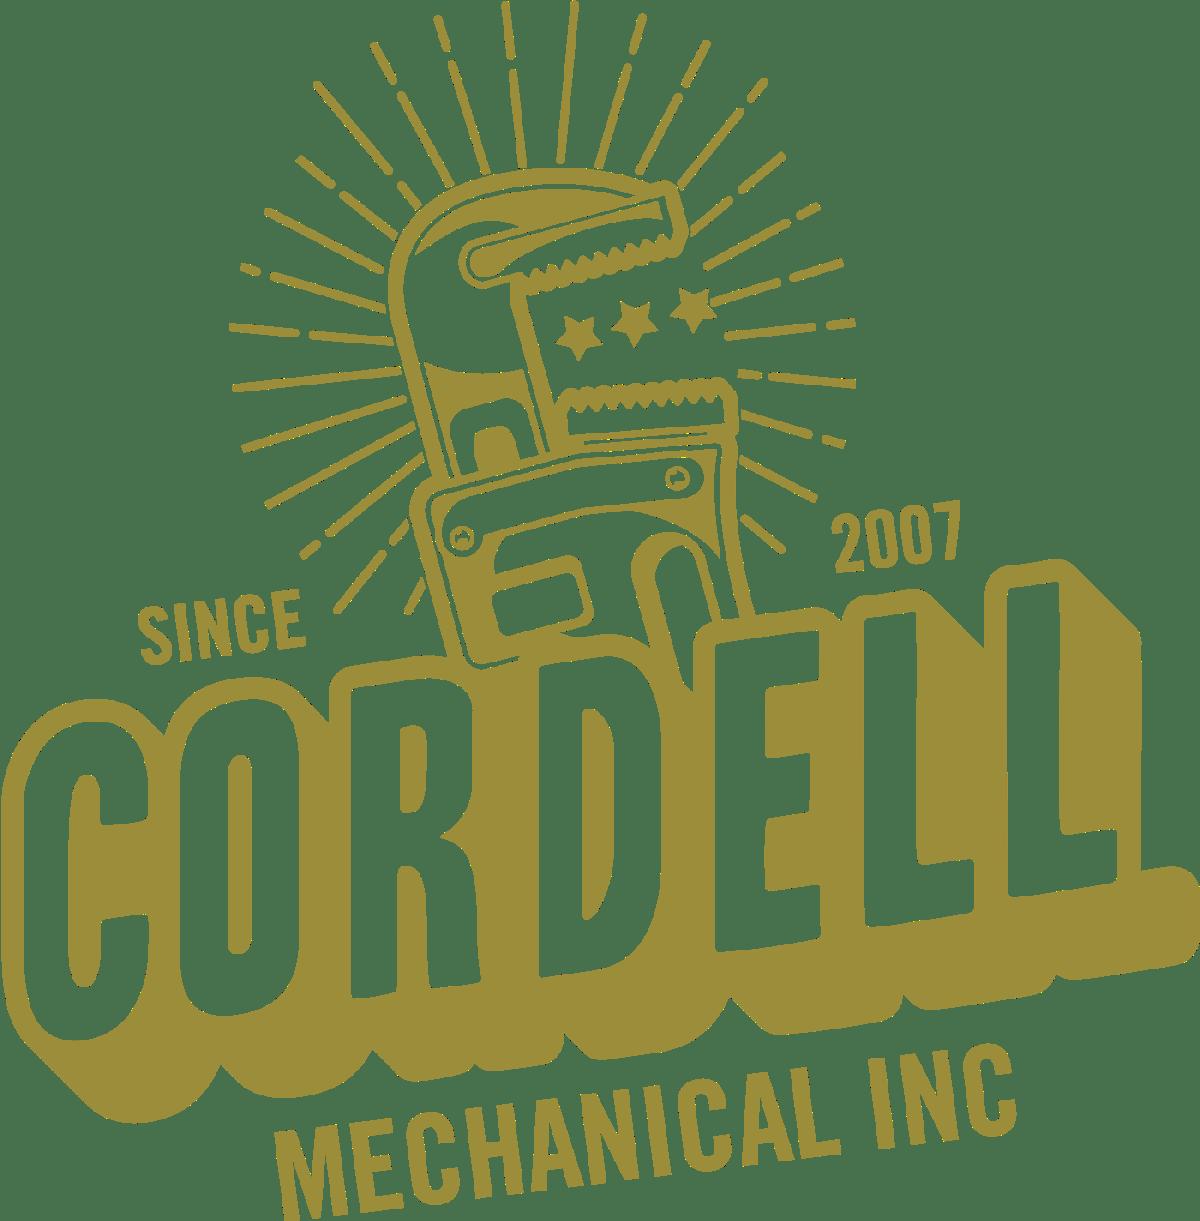 Cordell Mechanical Inc. Logo Design